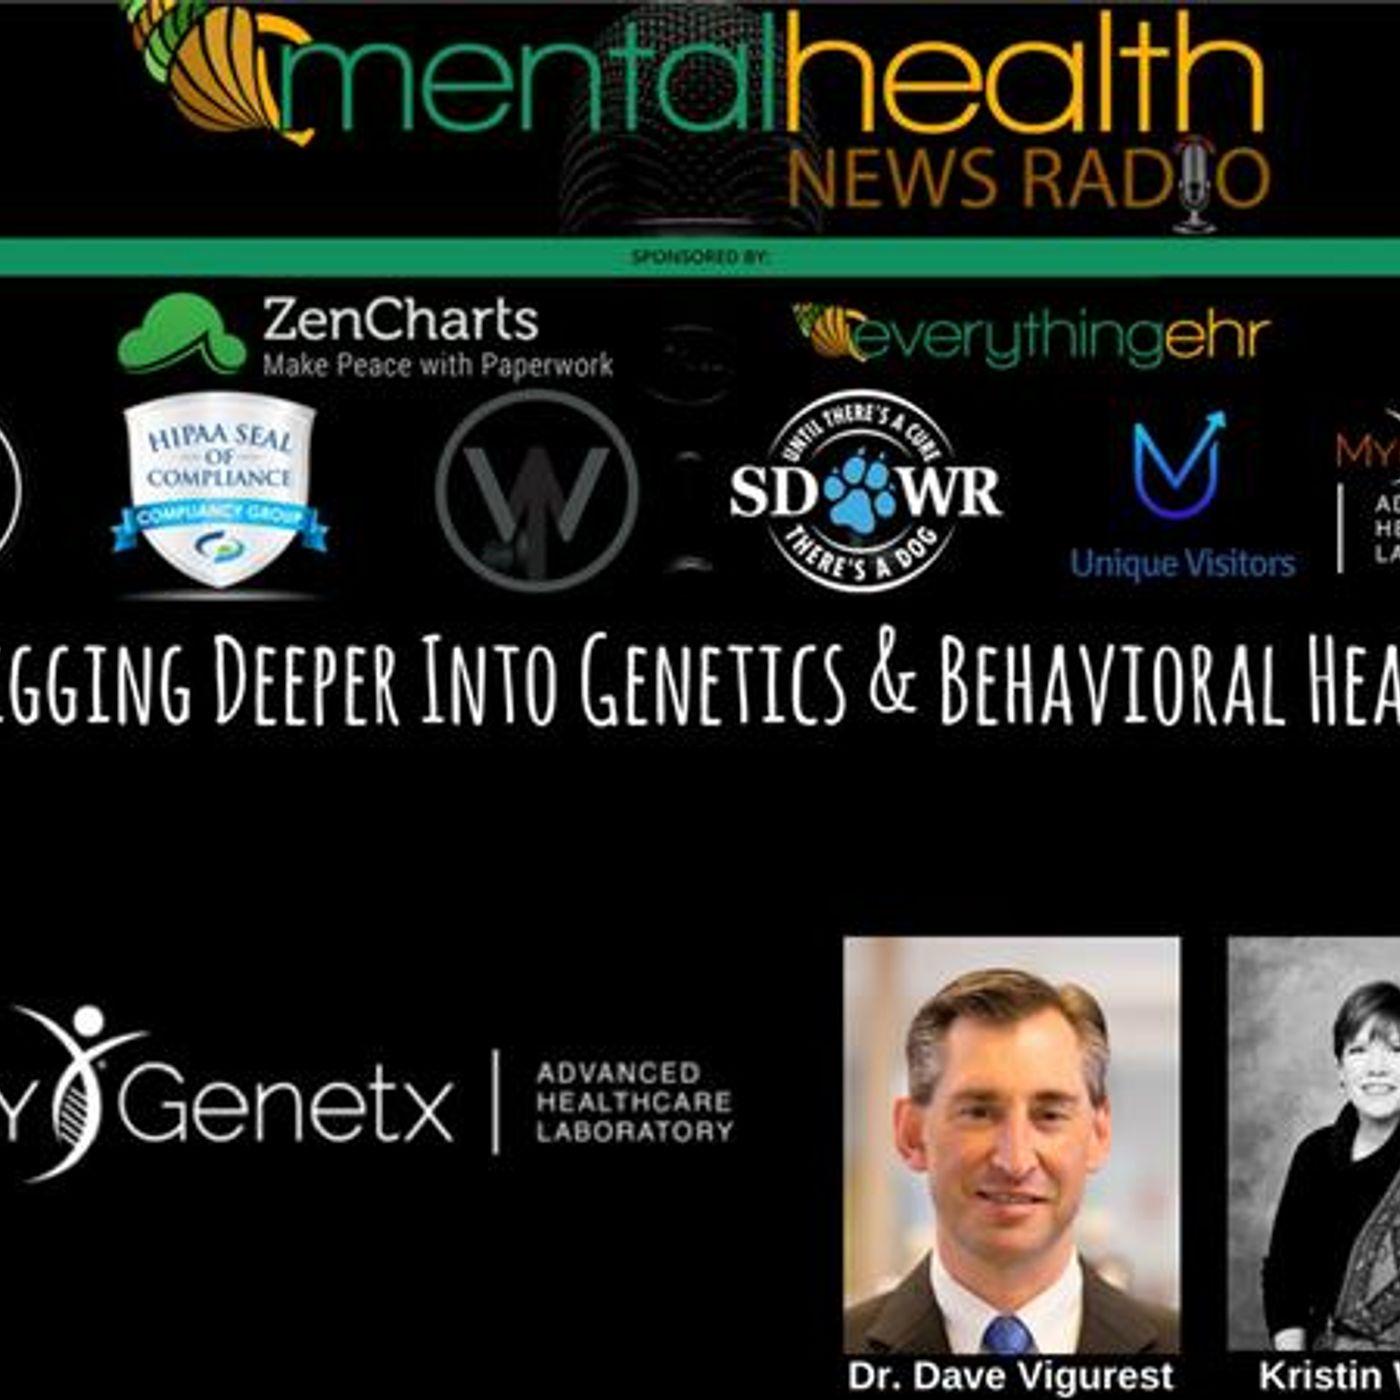 Mental Health News Radio - Digging Deeper Into Genetics & Behavioral Health with Dr. Dave Vigerust